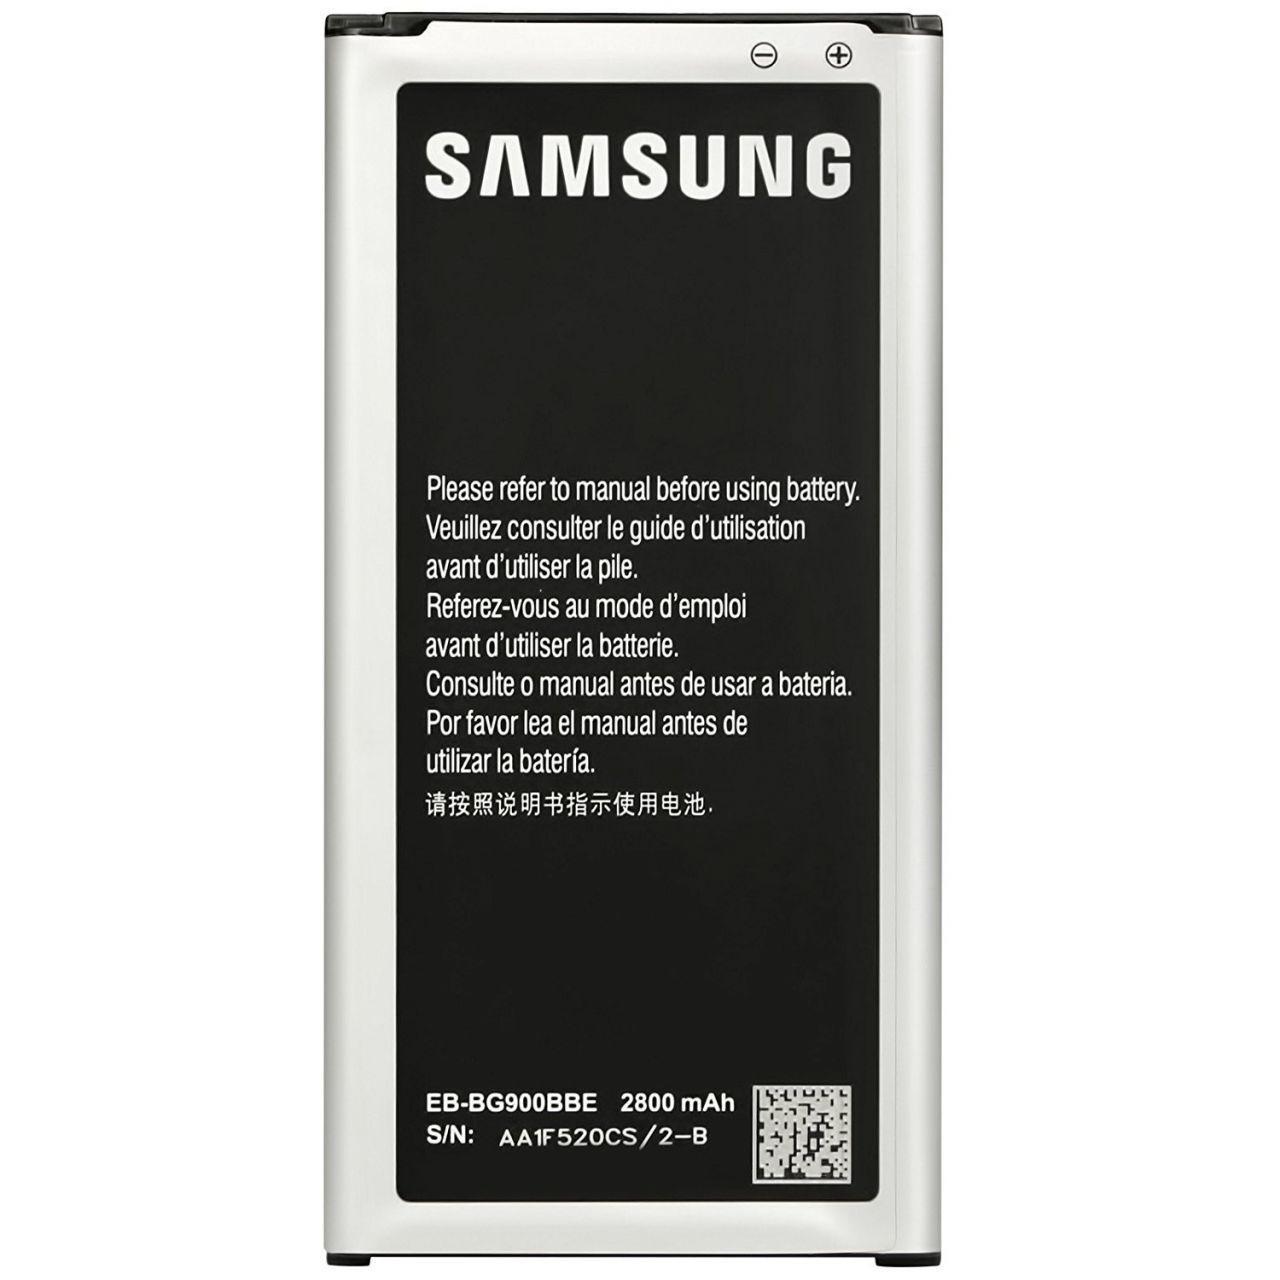 Акумулятор Samsung G900H Galaxy S5 / EB-BG900BB (2800 mAh) 12 міс. гарантії